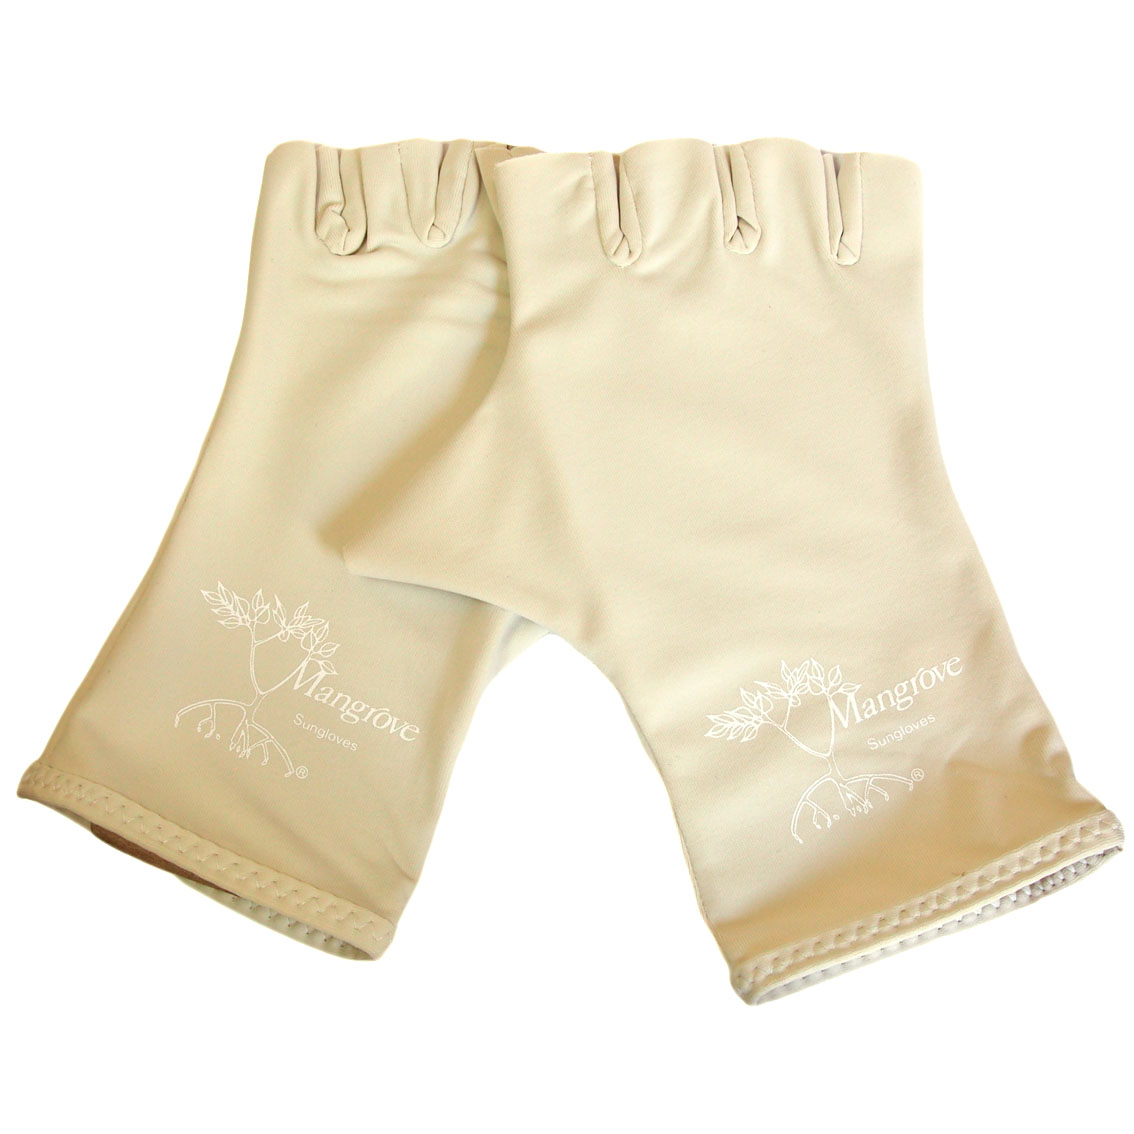 Luva Mangrove Sun Gloves